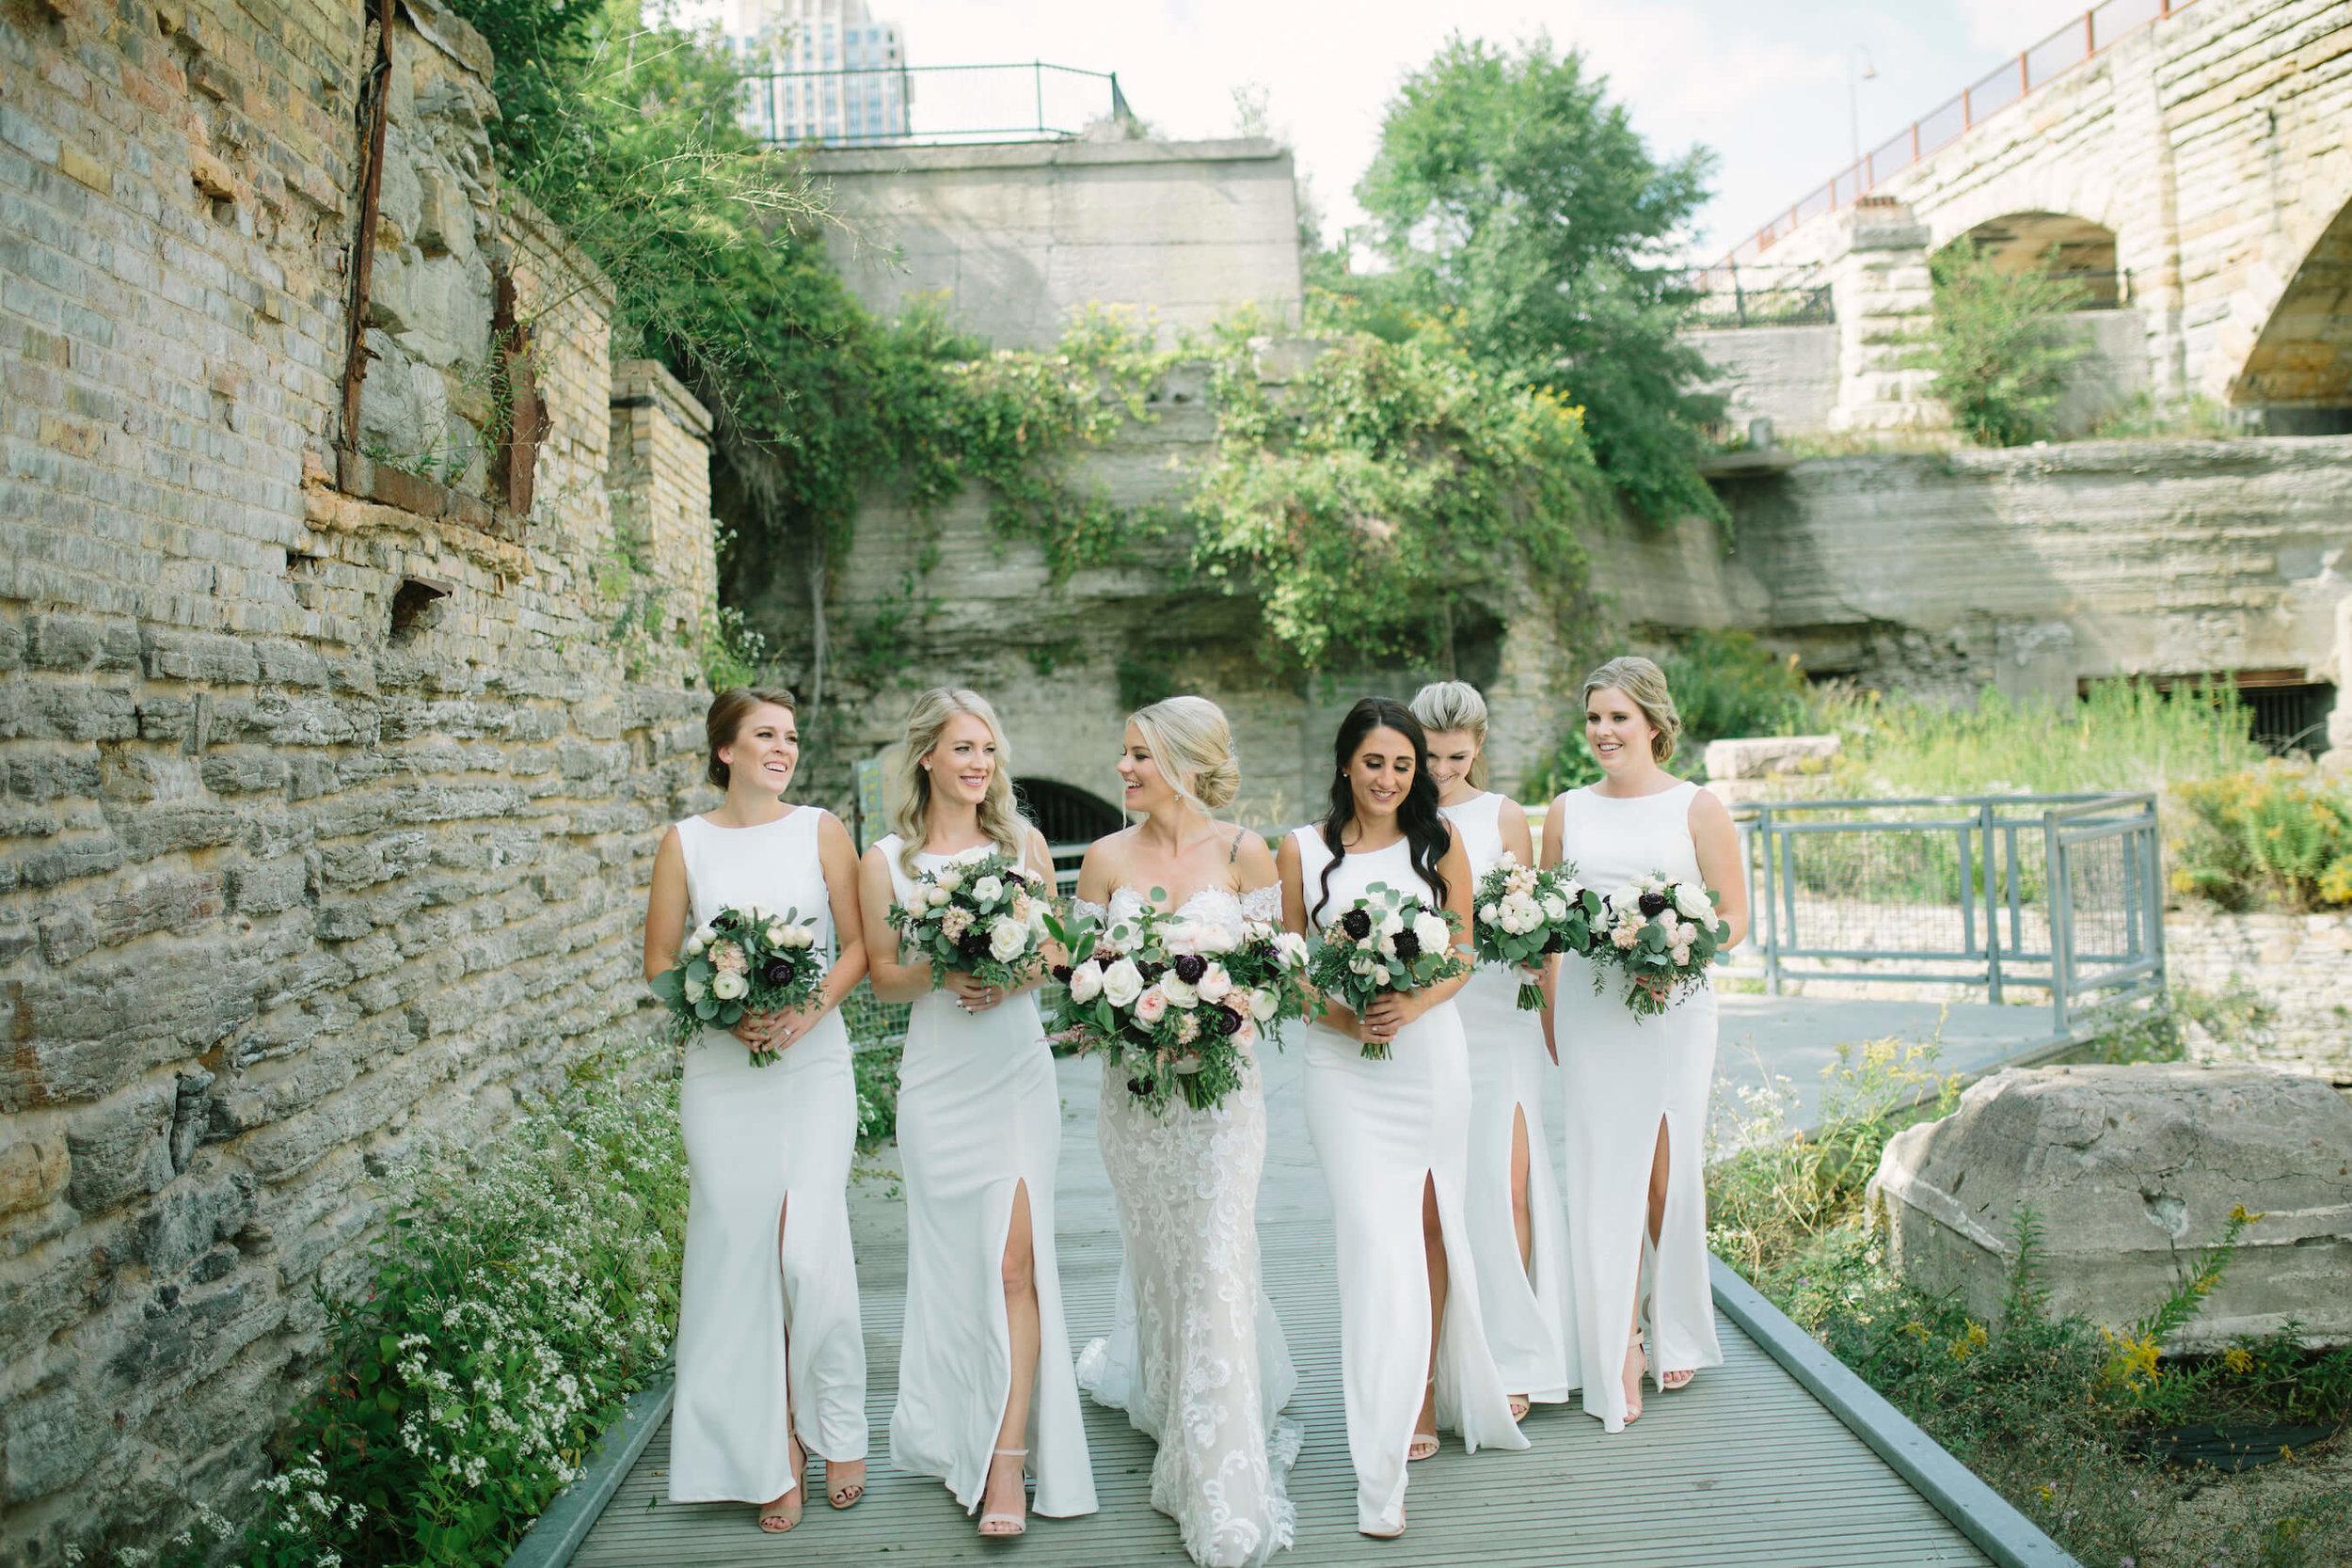 engle-olson-april-cj-wedding-jessica-holleque-4.jpg